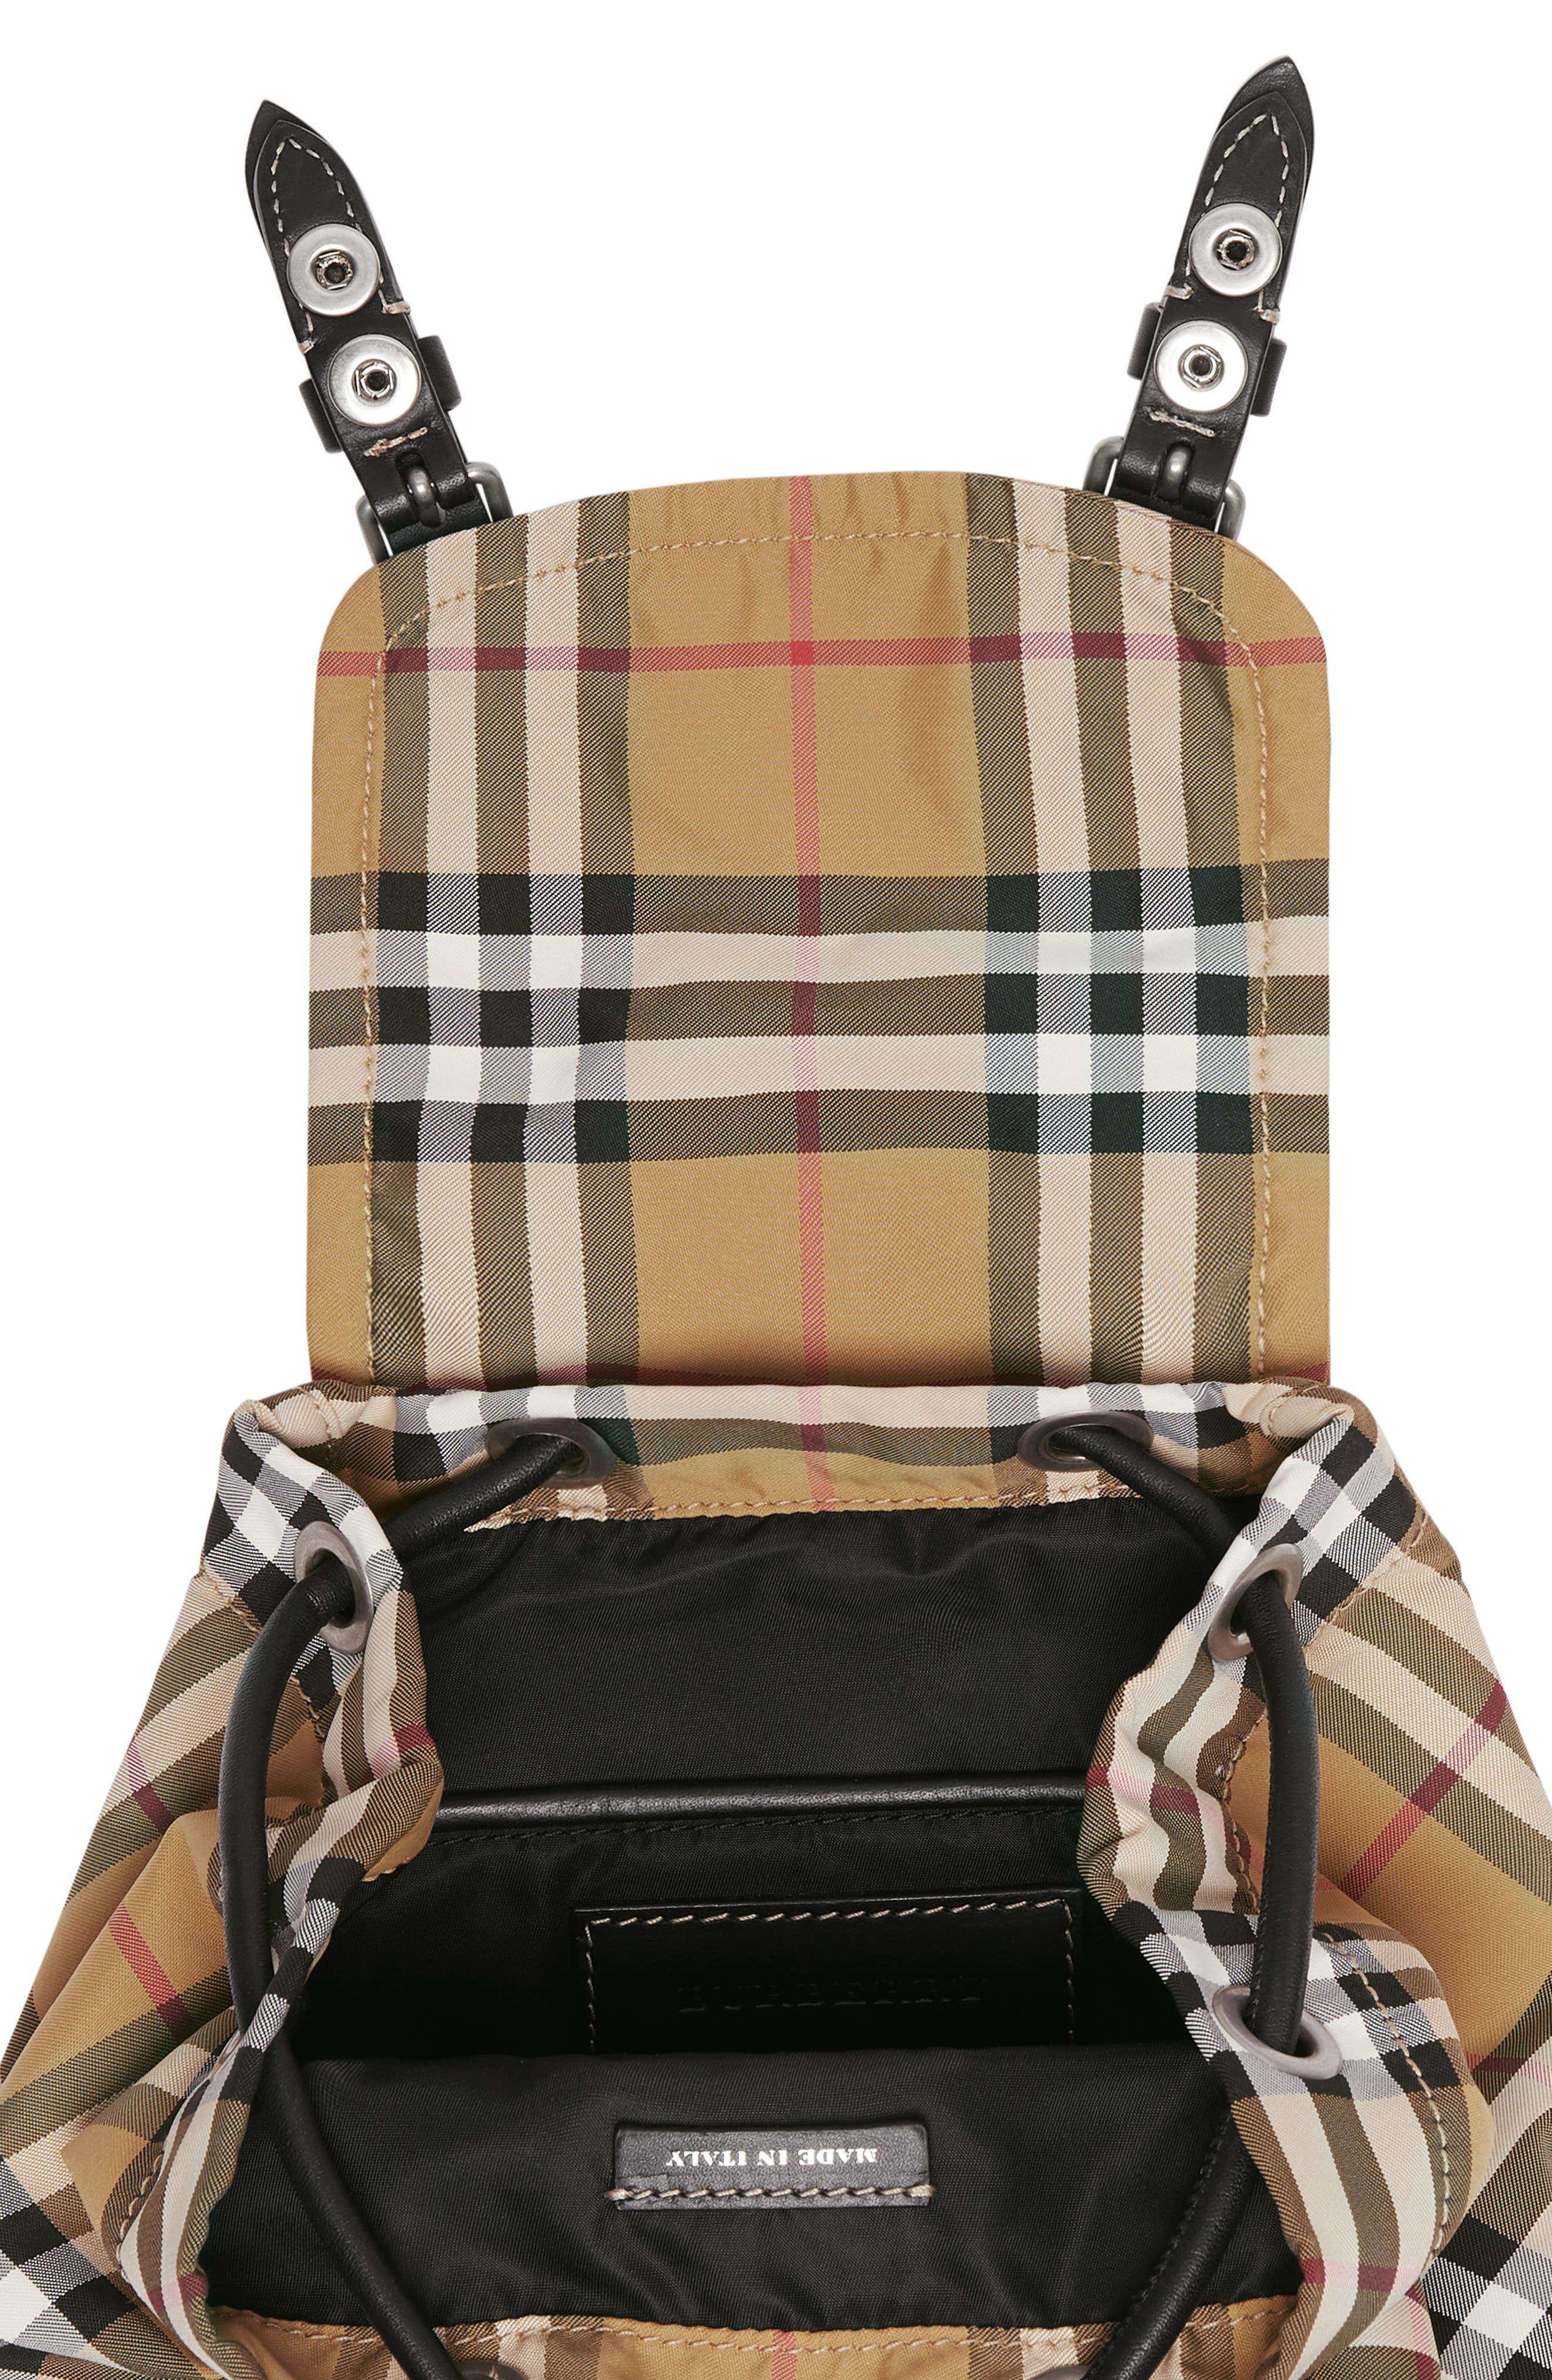 Small Rucksack Vintage Check Nylon Backpack,                             Alternate thumbnail 6, color,                             ANTIQUE YELLOW/ BLACK